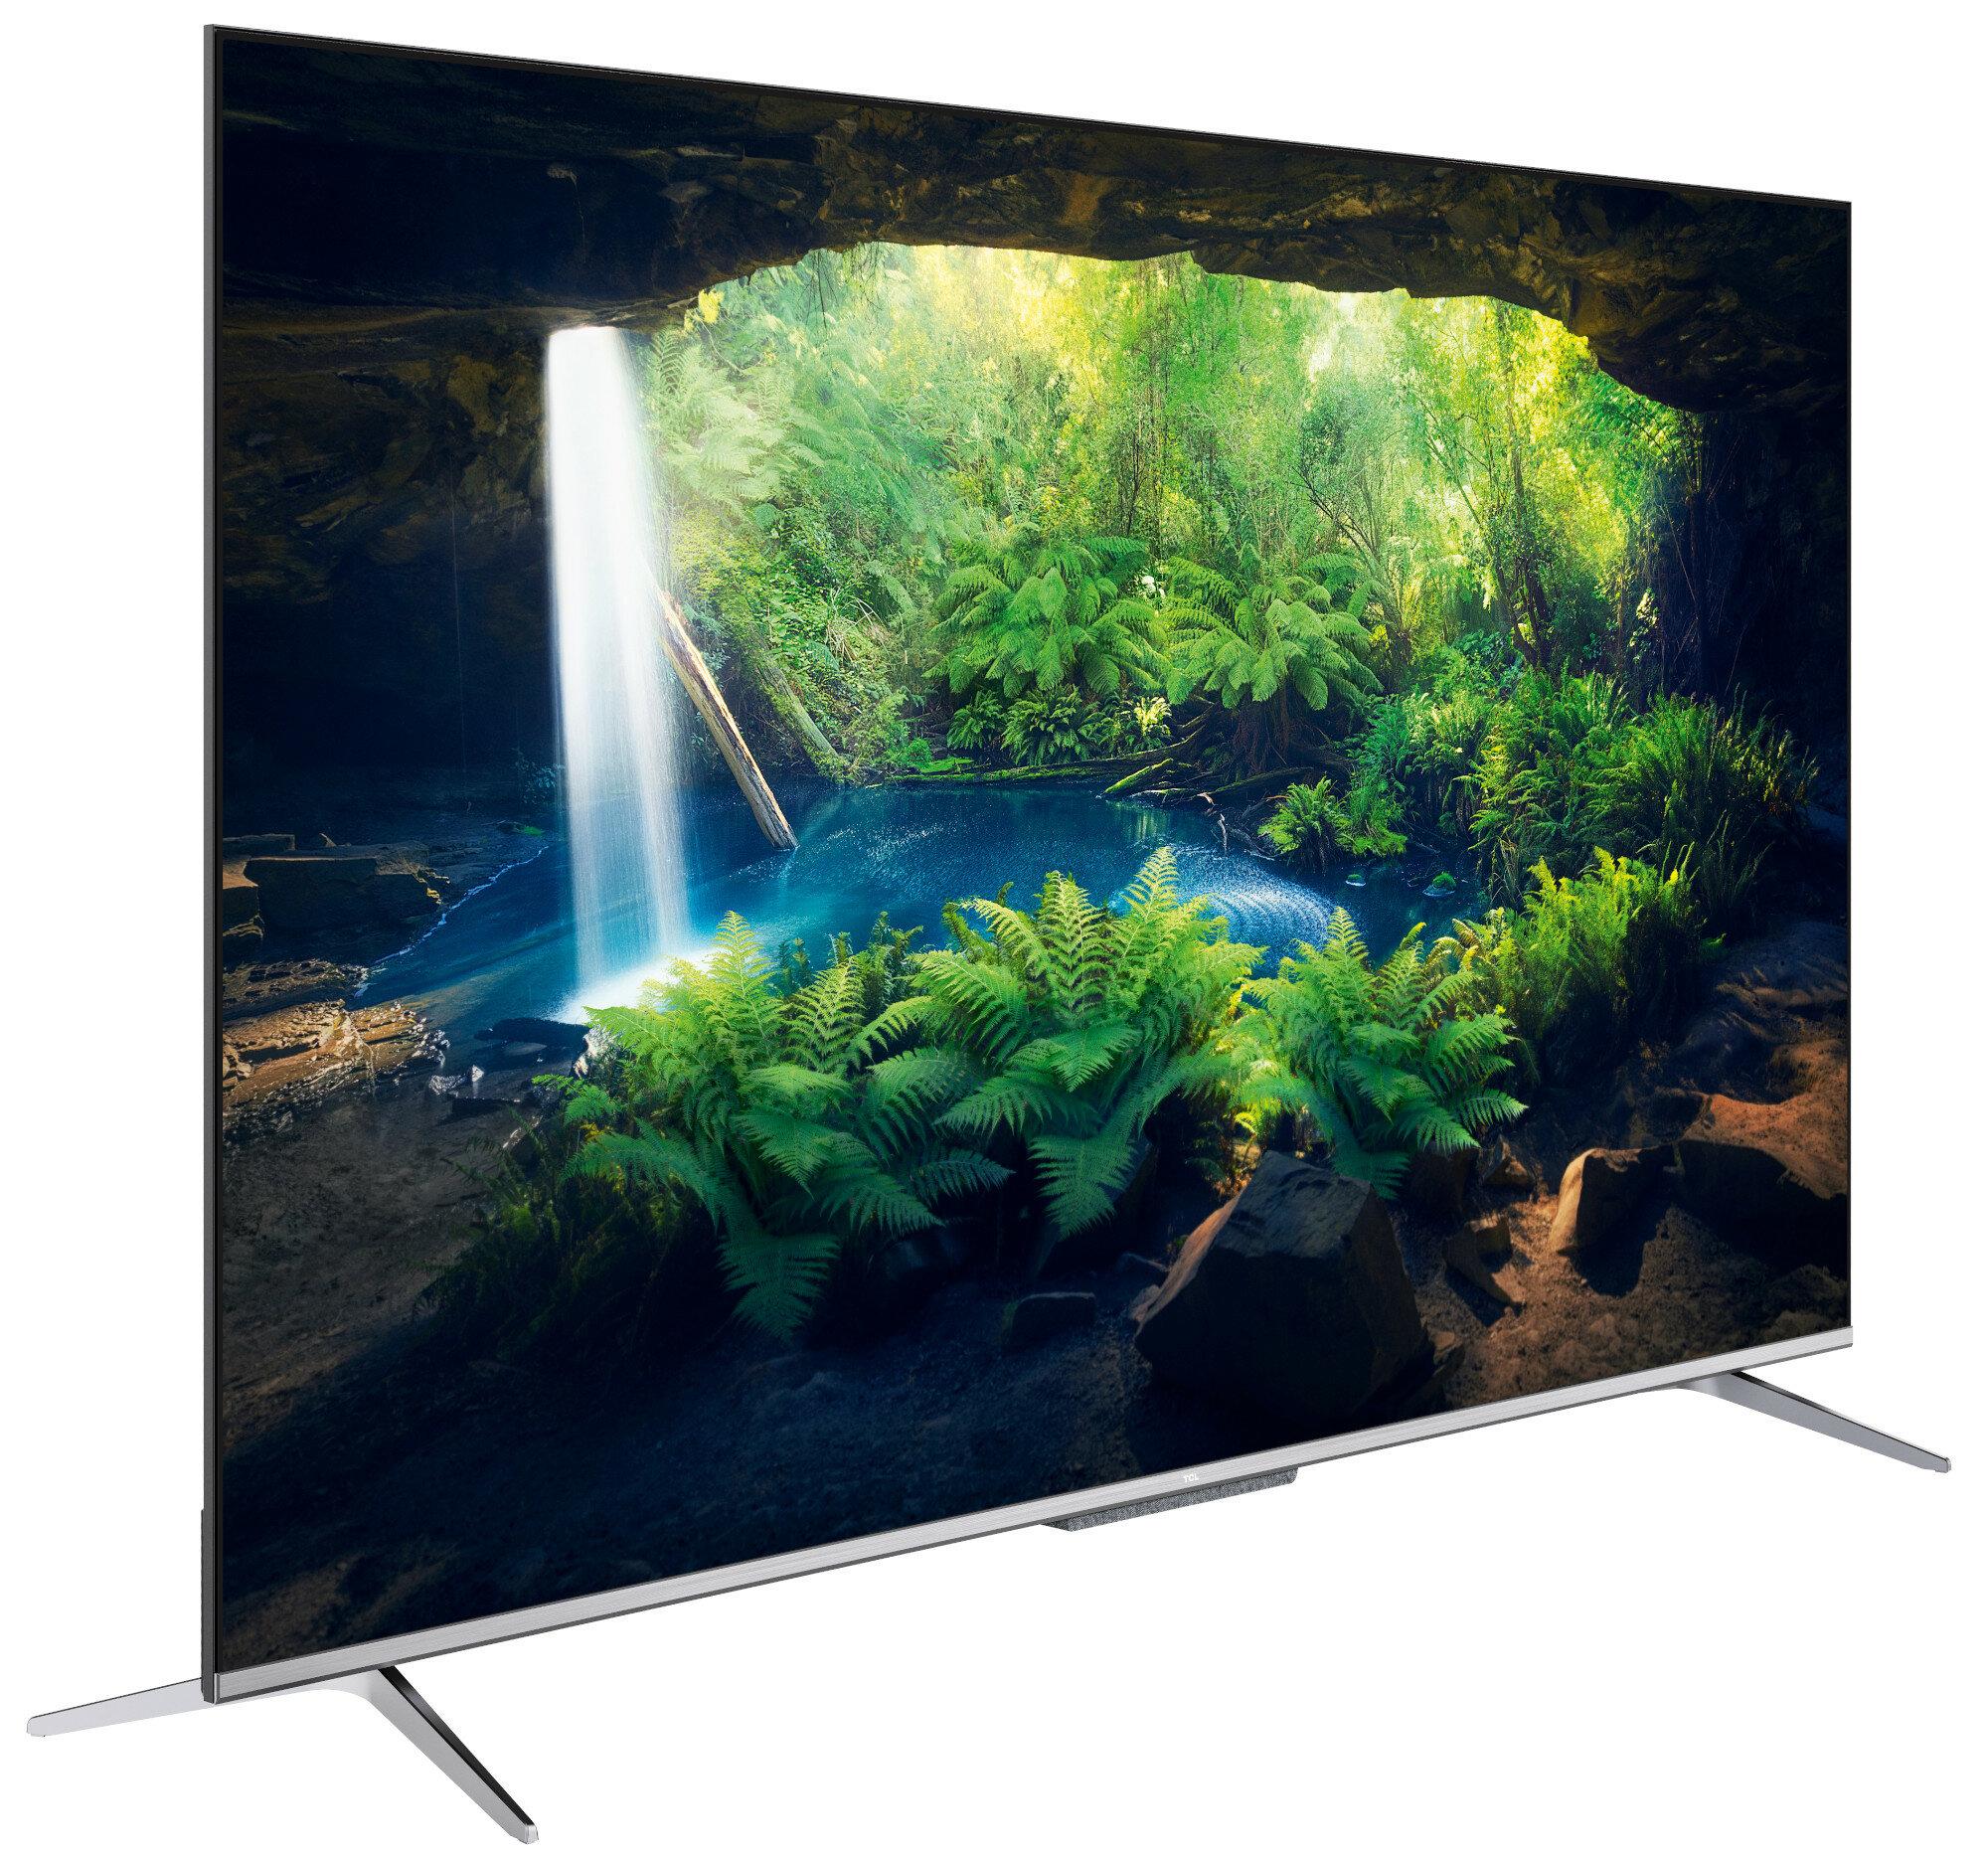 "Telewizor TCL 55P715 55"" LED 4K Android TV"